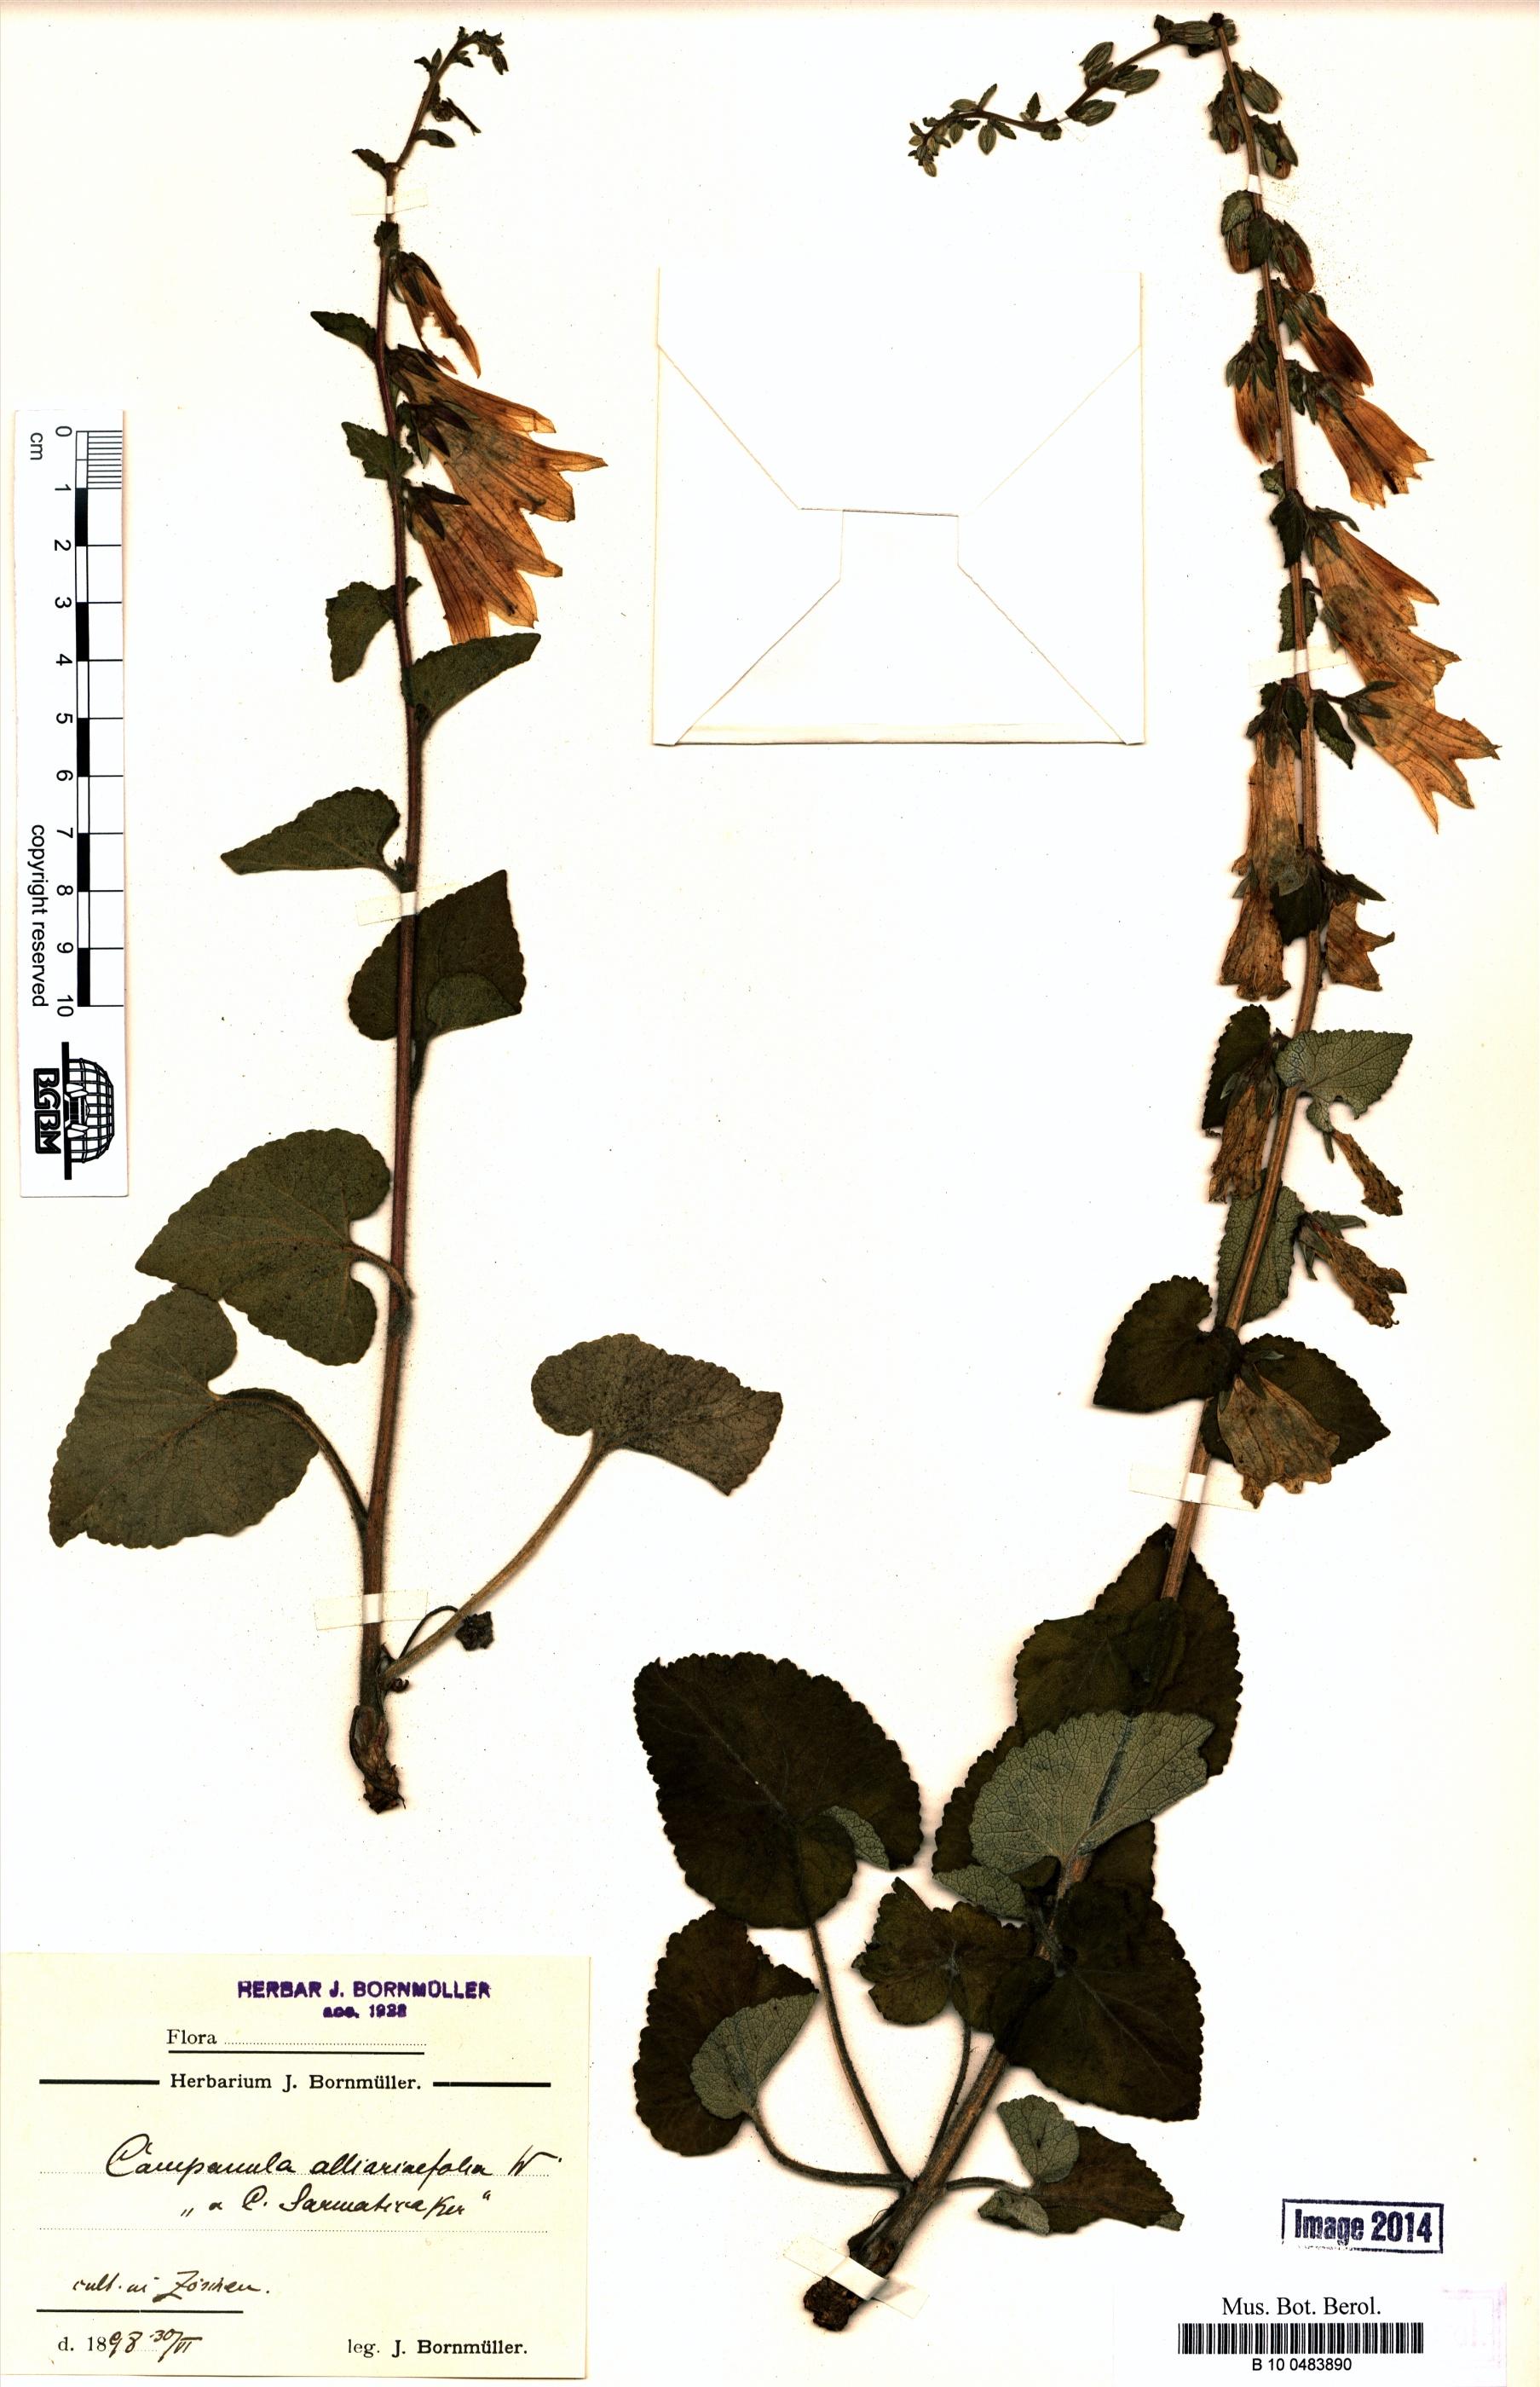 http://ww2.bgbm.org/herbarium/images/B/10/04/83/89/B_10_0483890.jpg